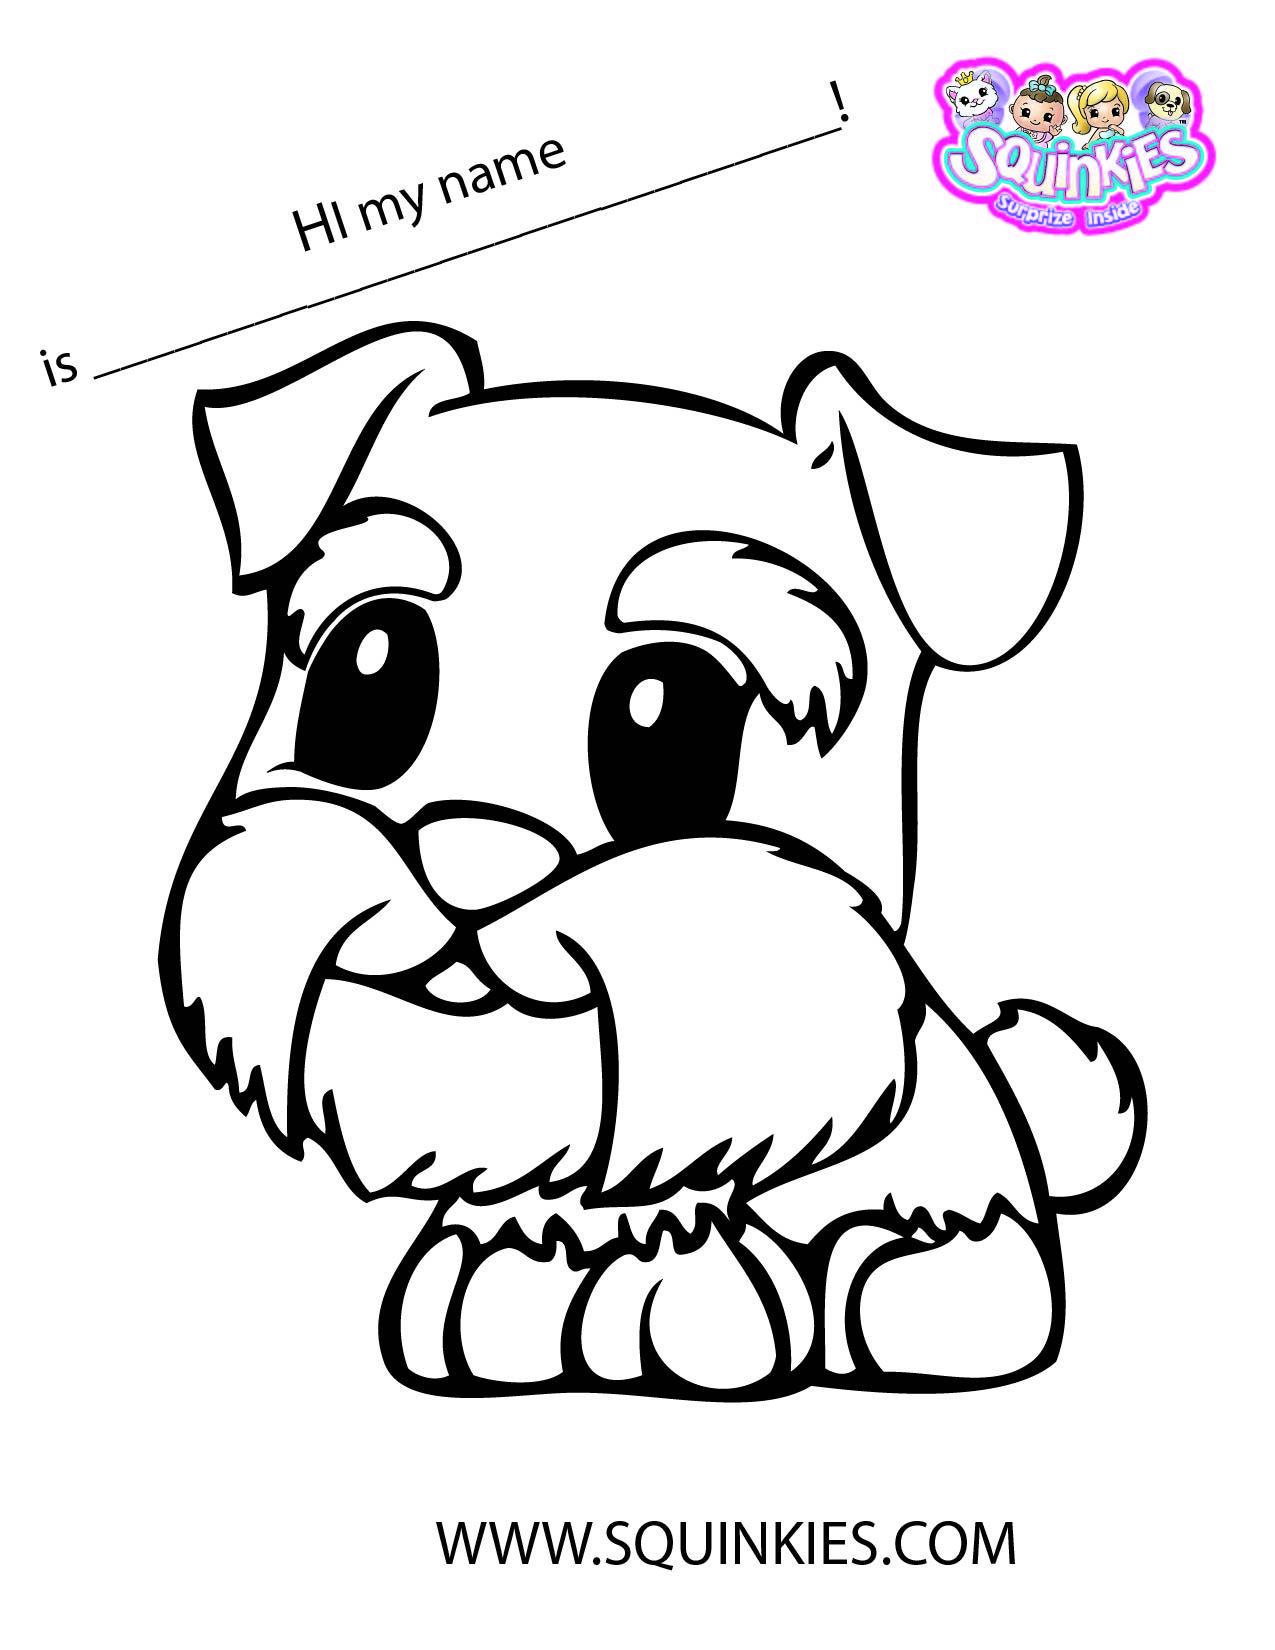 squinkies coloring page - Squinkies Coloring Pages